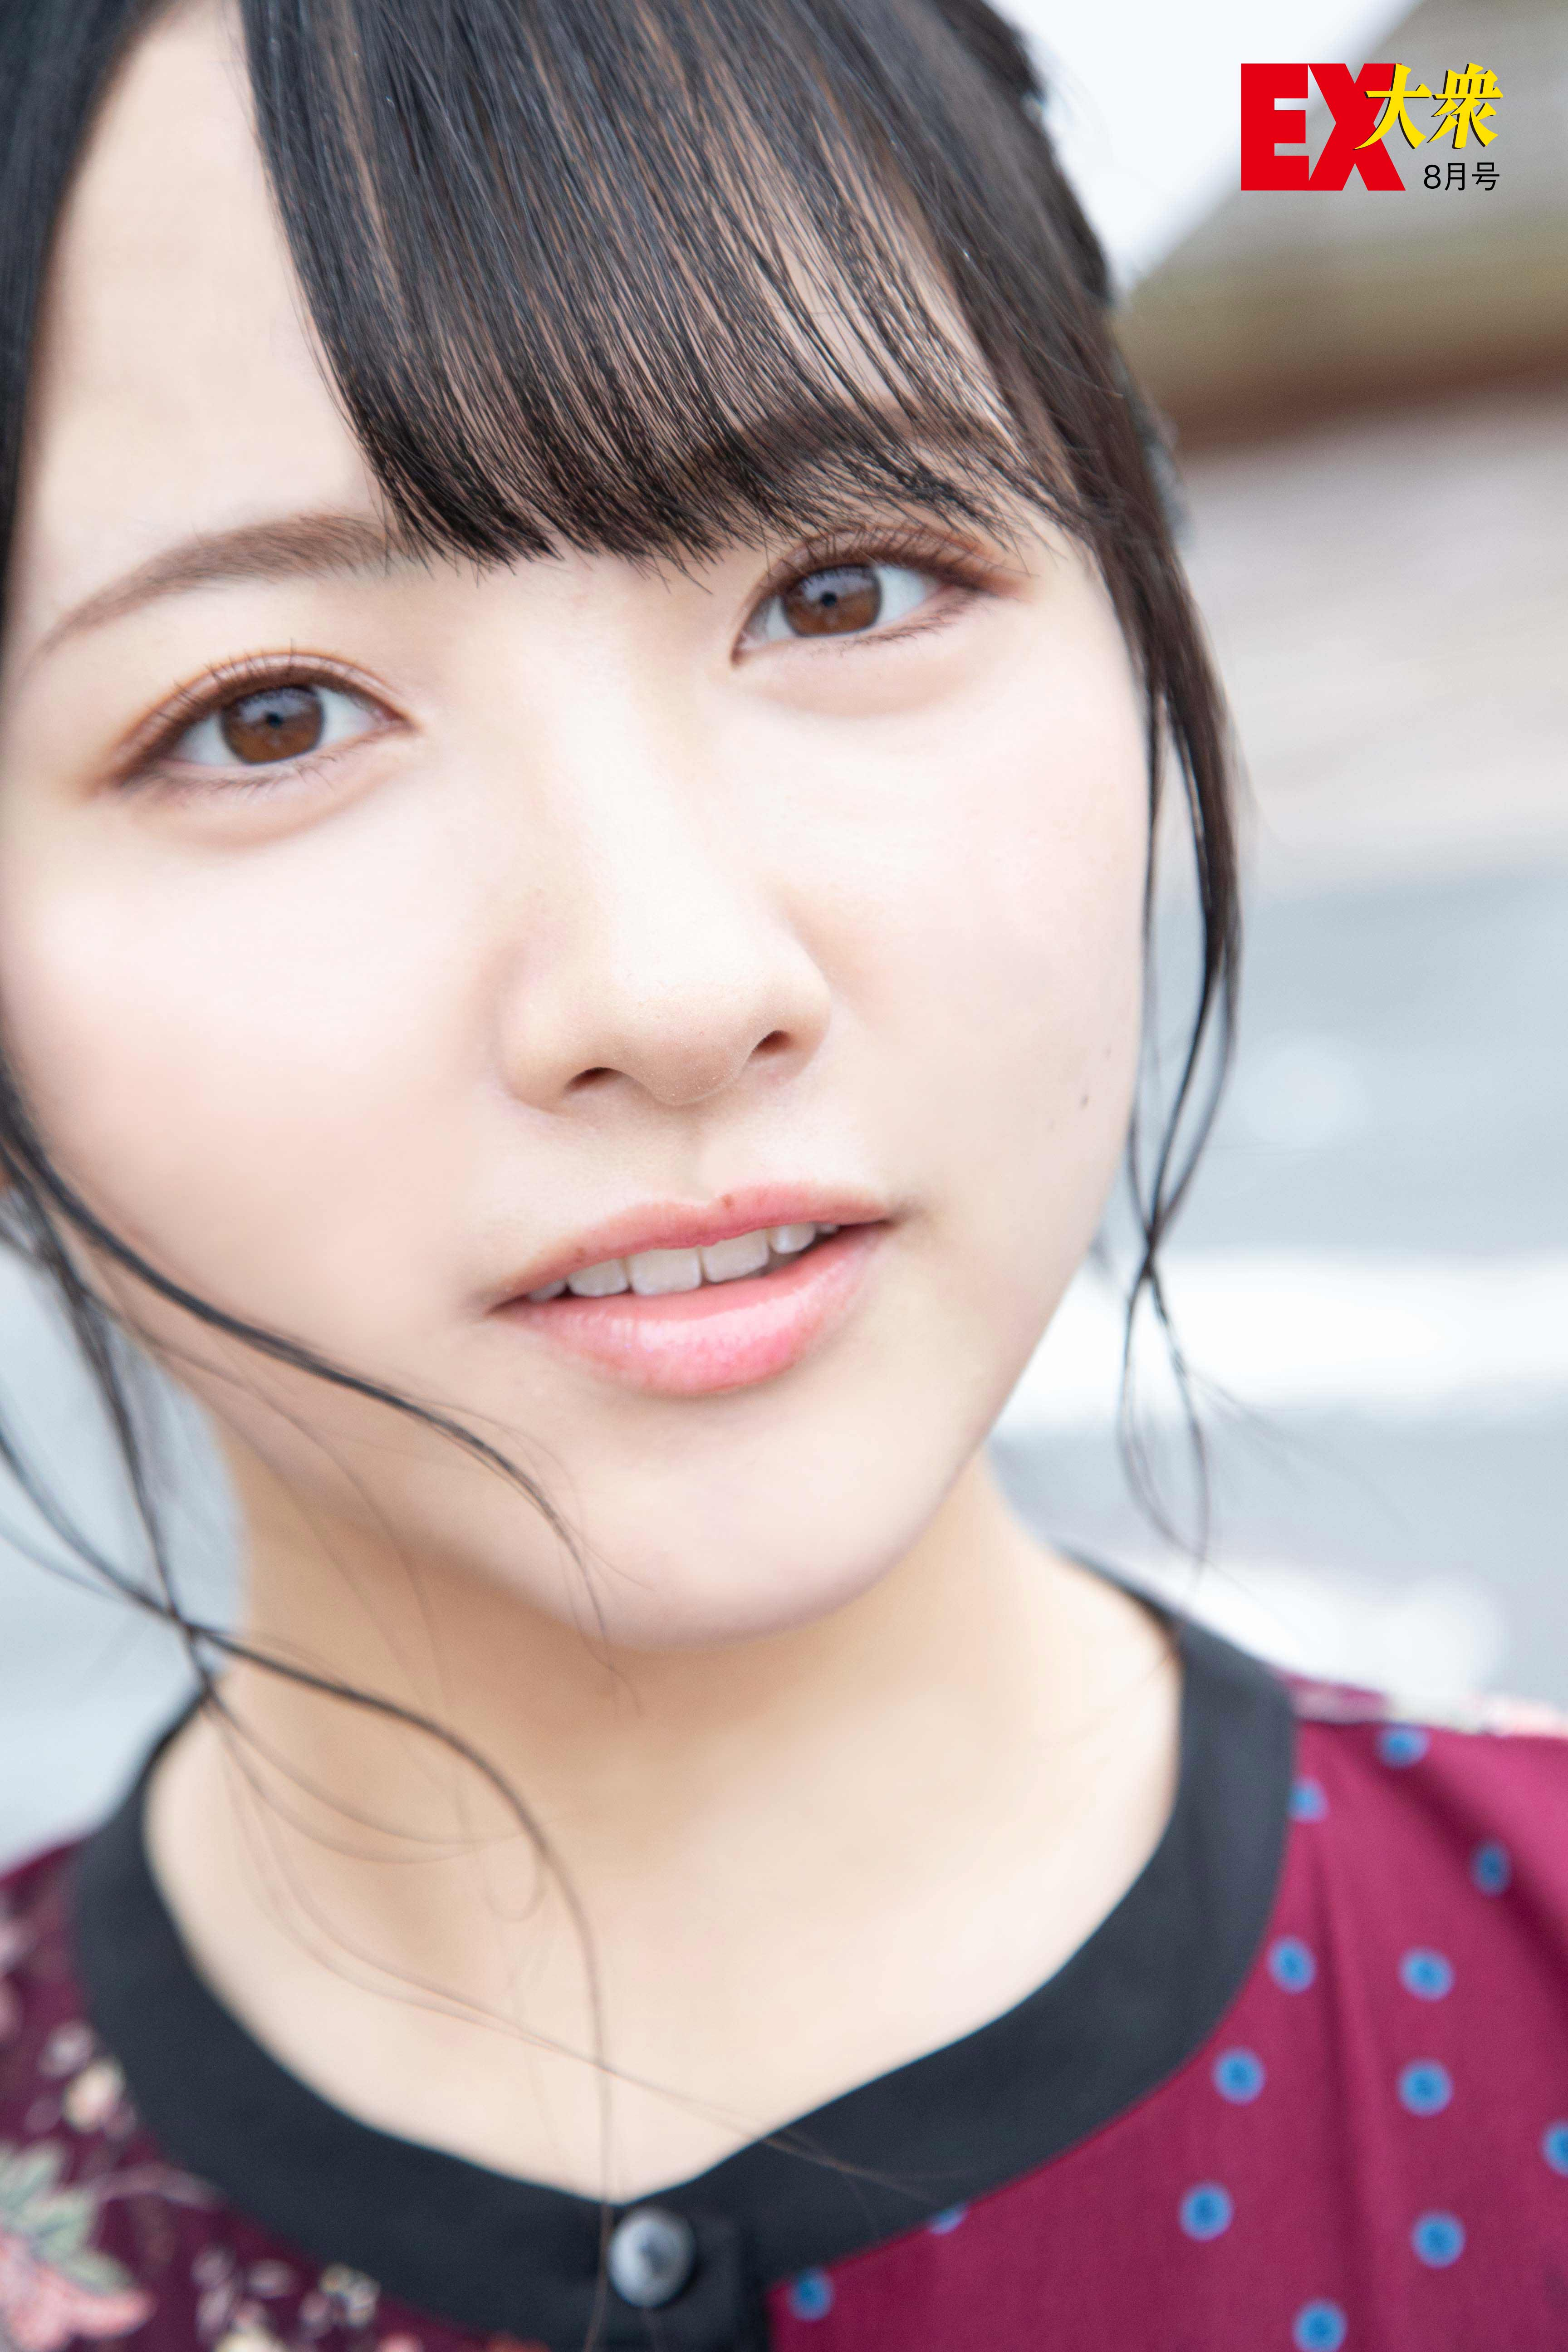 STU48石田千穂の本誌未掲載カット3枚を大公開!【EX大衆8月号】の画像002